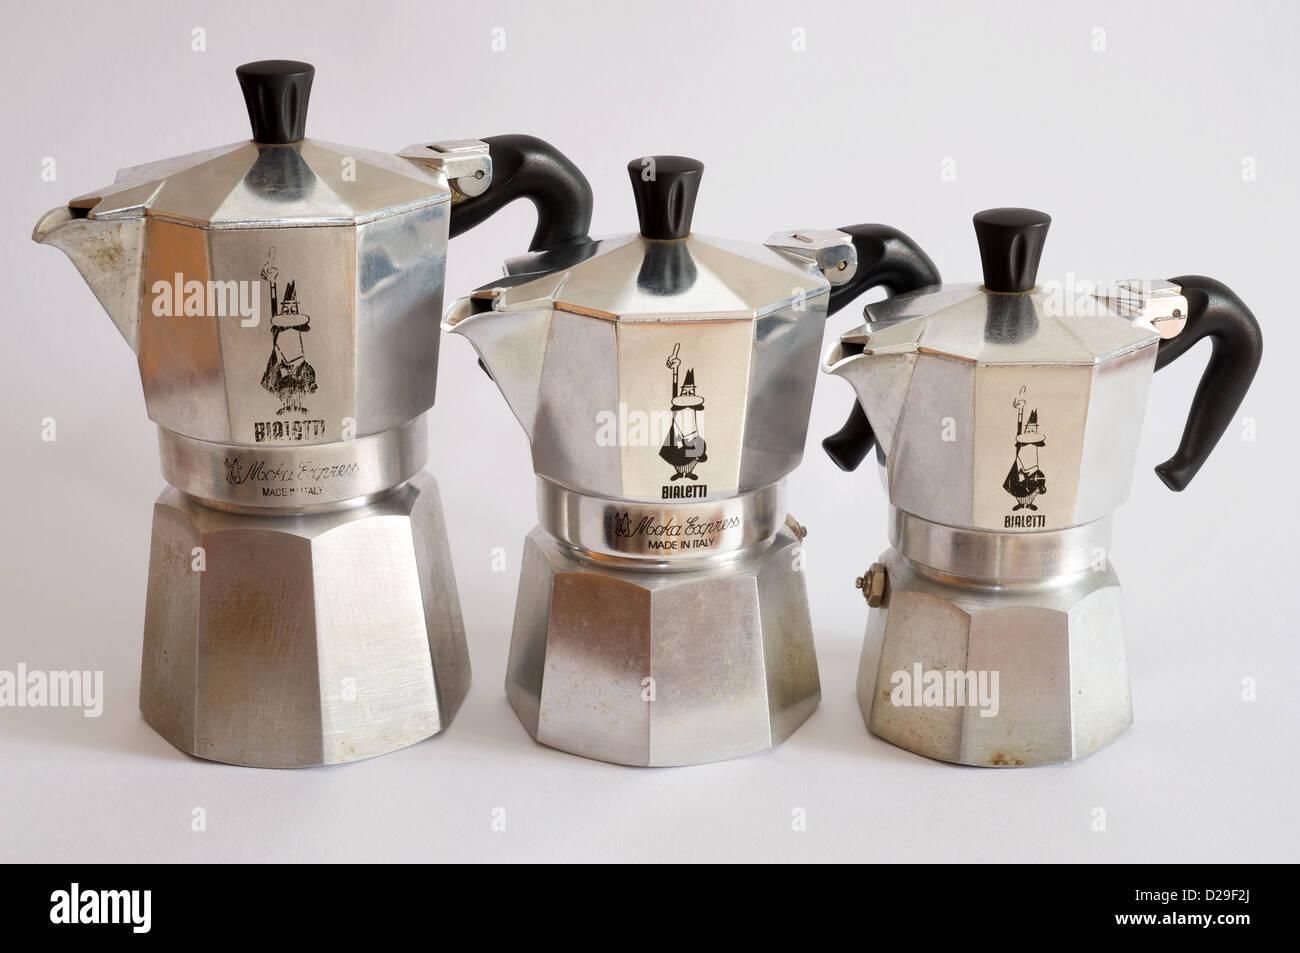 Bialetti moka express coffee pots - Stock Image